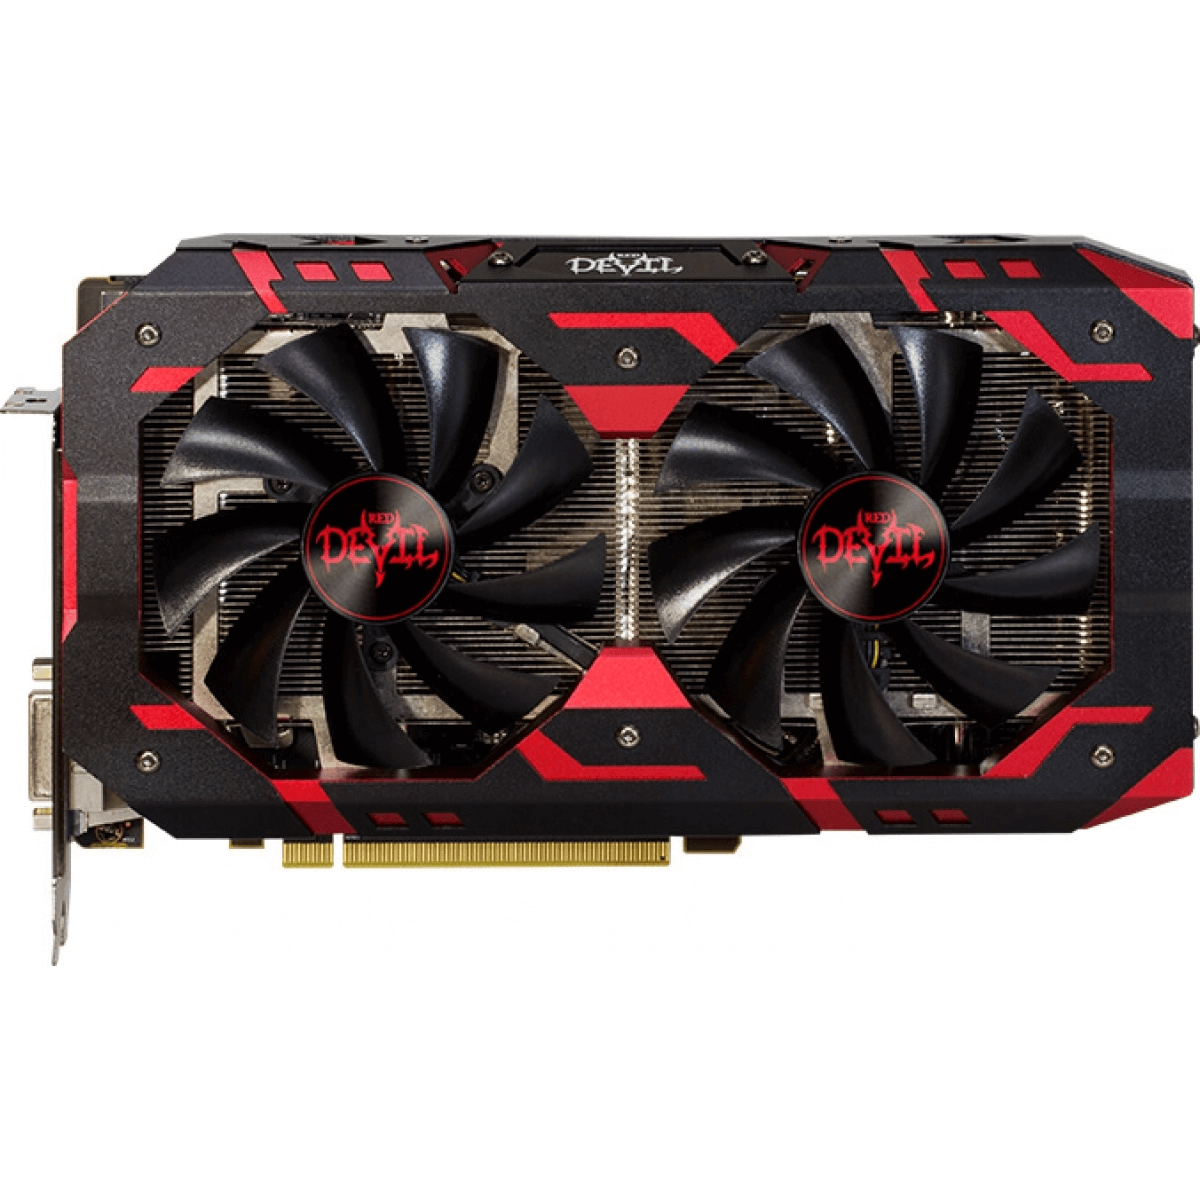 Kit Upgrade PowerColor RX 580 Red Devil + AMD Ryzen 9 5950X + Brinde Jogo Dirt 5